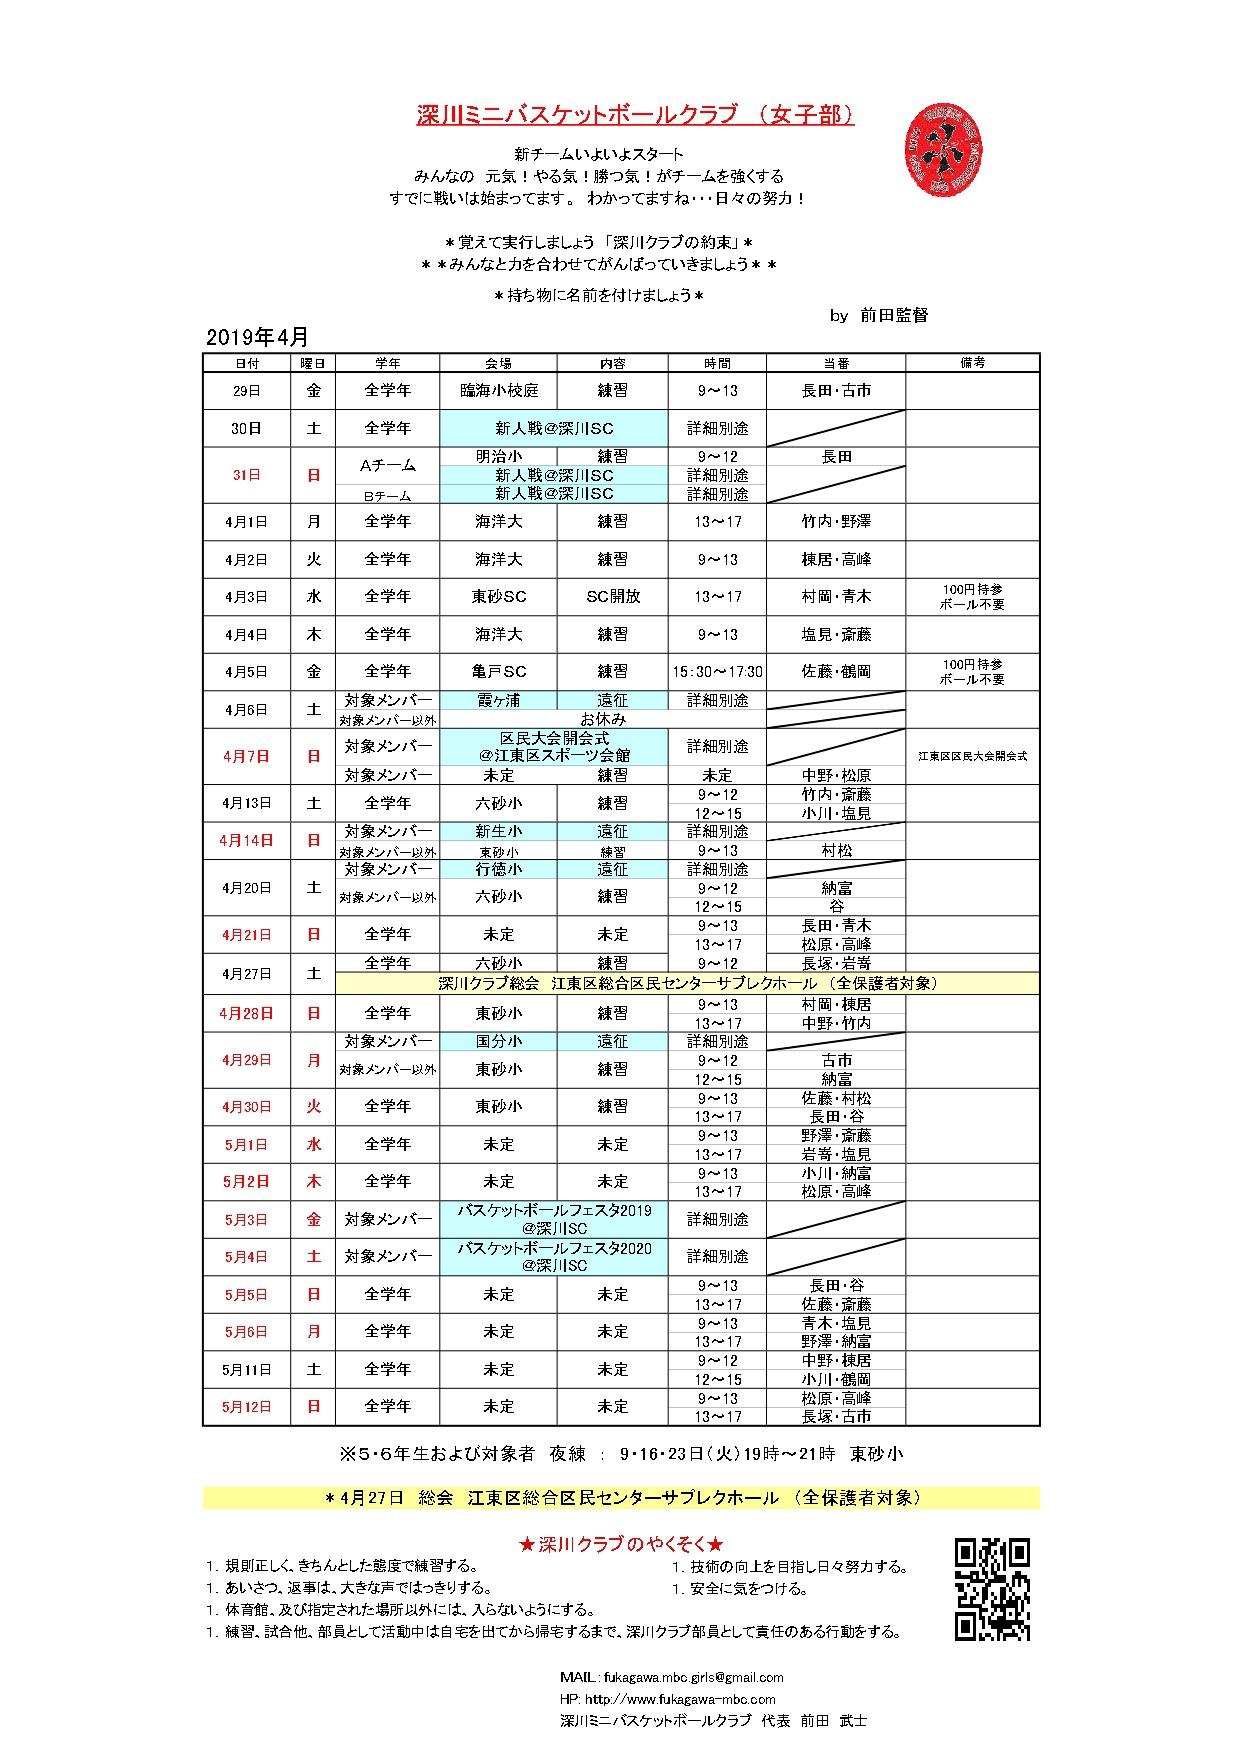 A7C7B49C-BCB9-43A3-9919-93D468BB1148